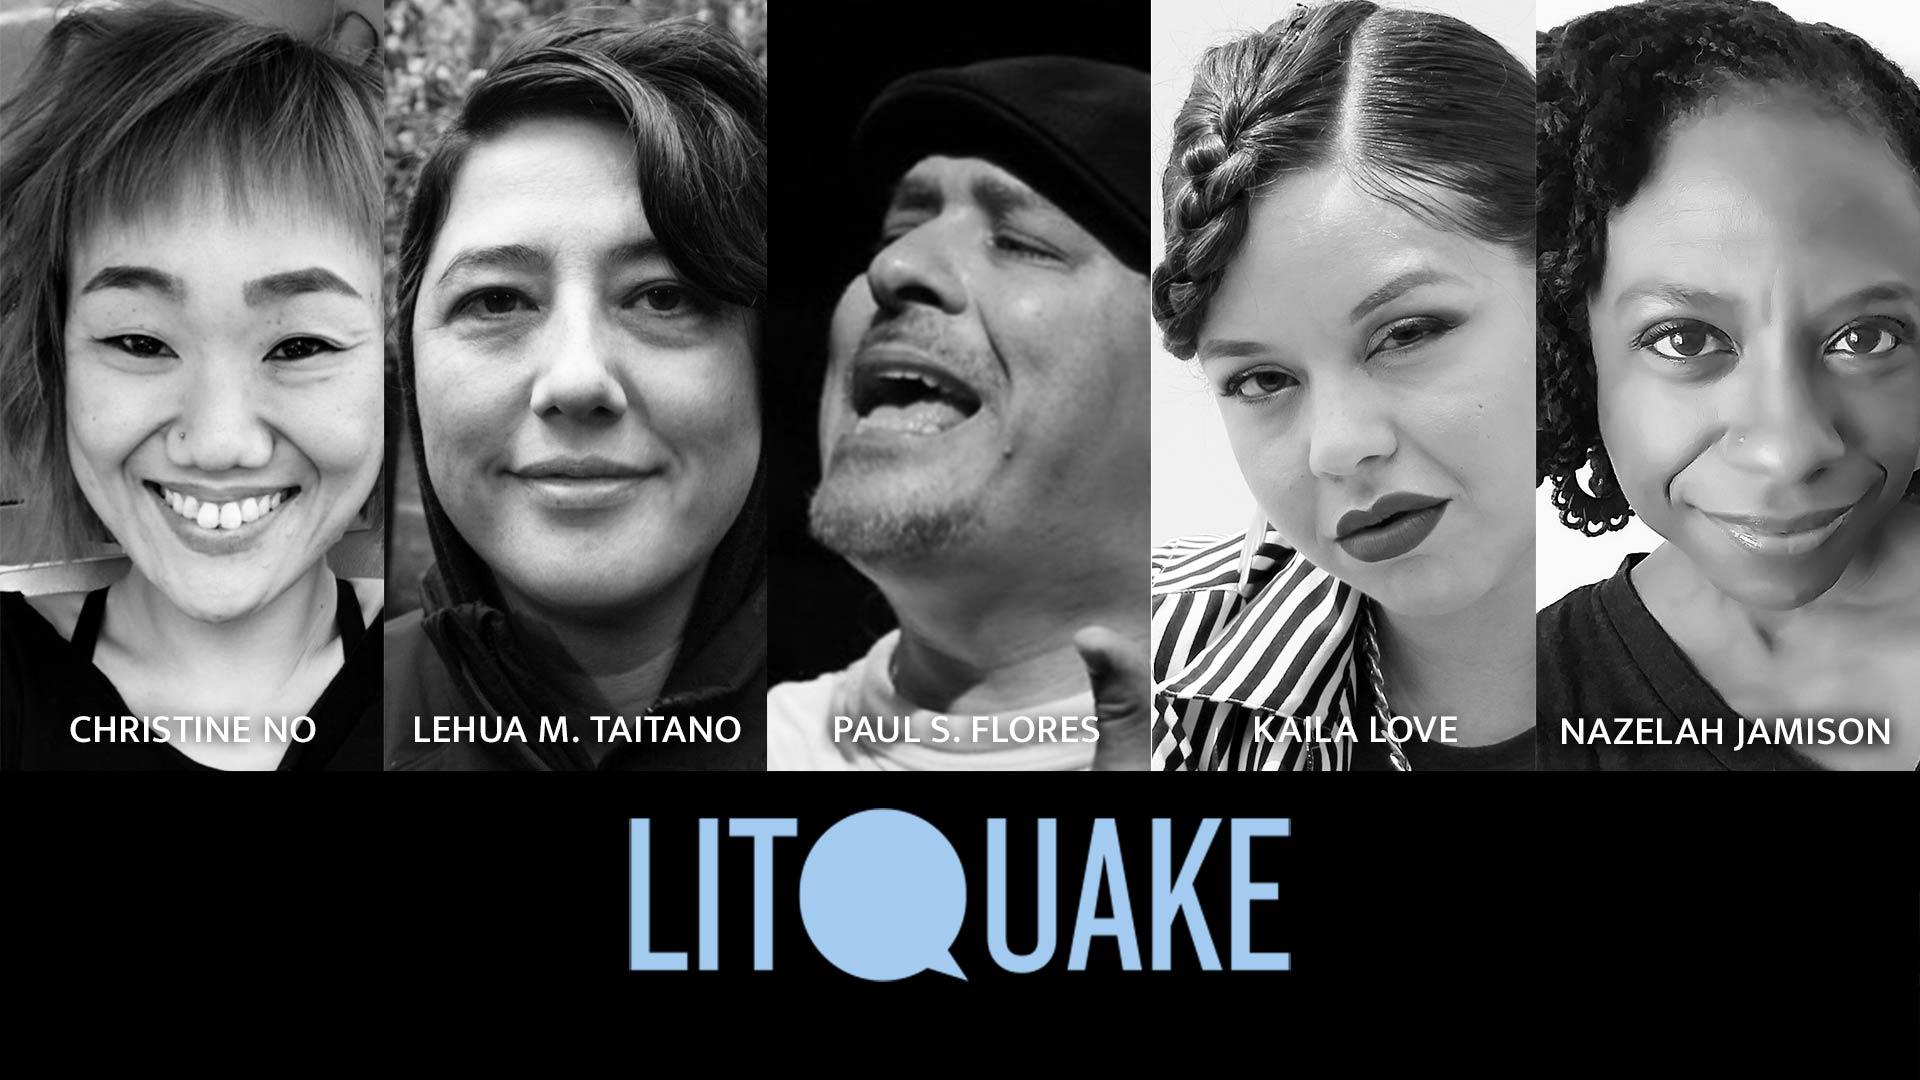 Photos of Litquake poets Christine No, Lehua M. Taitano, Paul S. Flores, Kaila Love, and Nazelah Jamison.